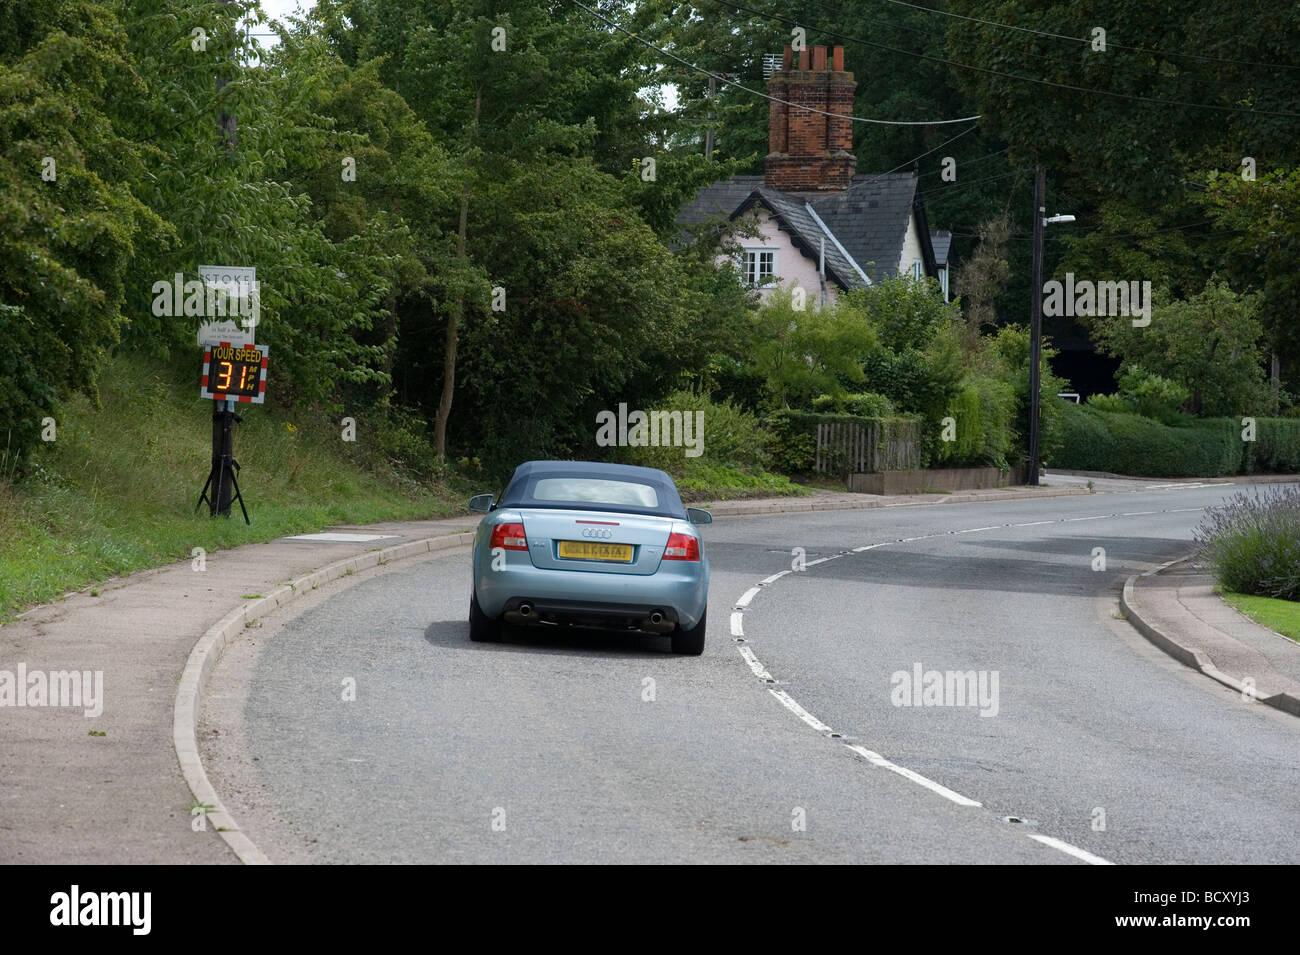 Speed Smiley SID Radar Speed indicator device SID Slow down 30mph village Sufflok stoke by clare Speeding transport - Stock Image